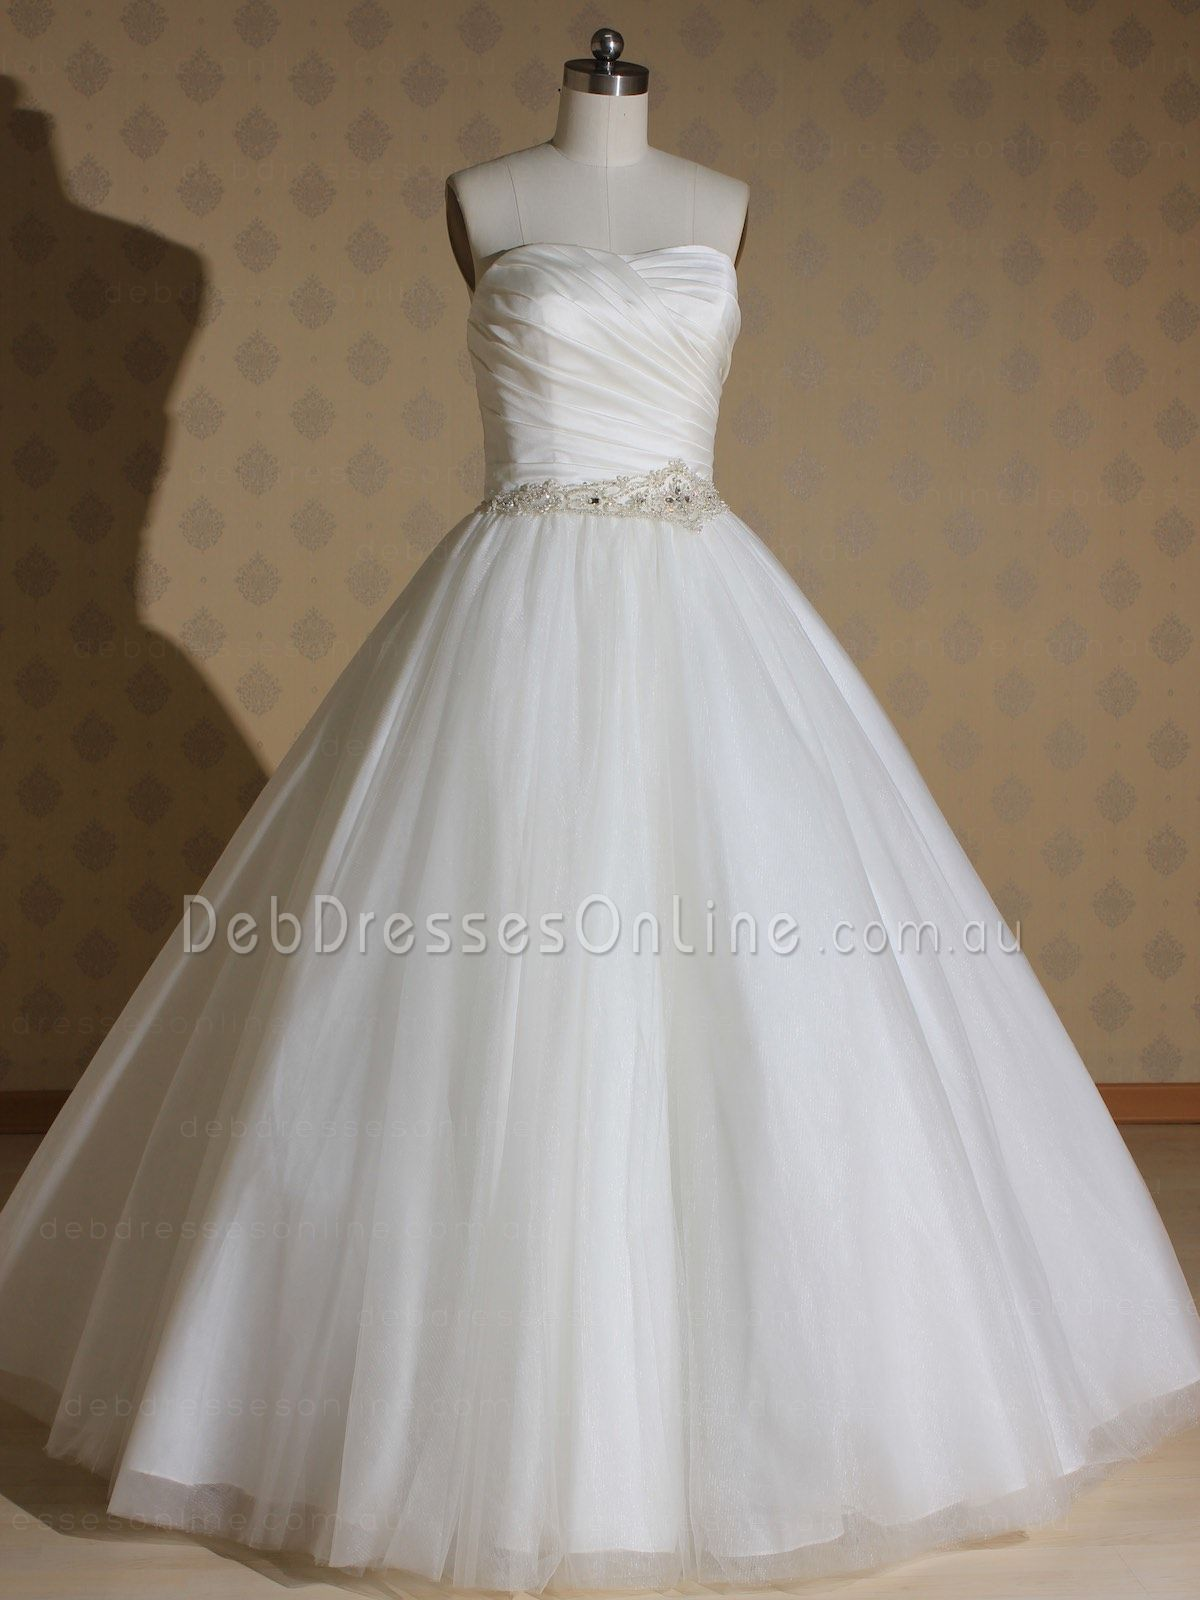 Clearance Sale Princess Debutante Gown - tr2-761 | Debutante ...